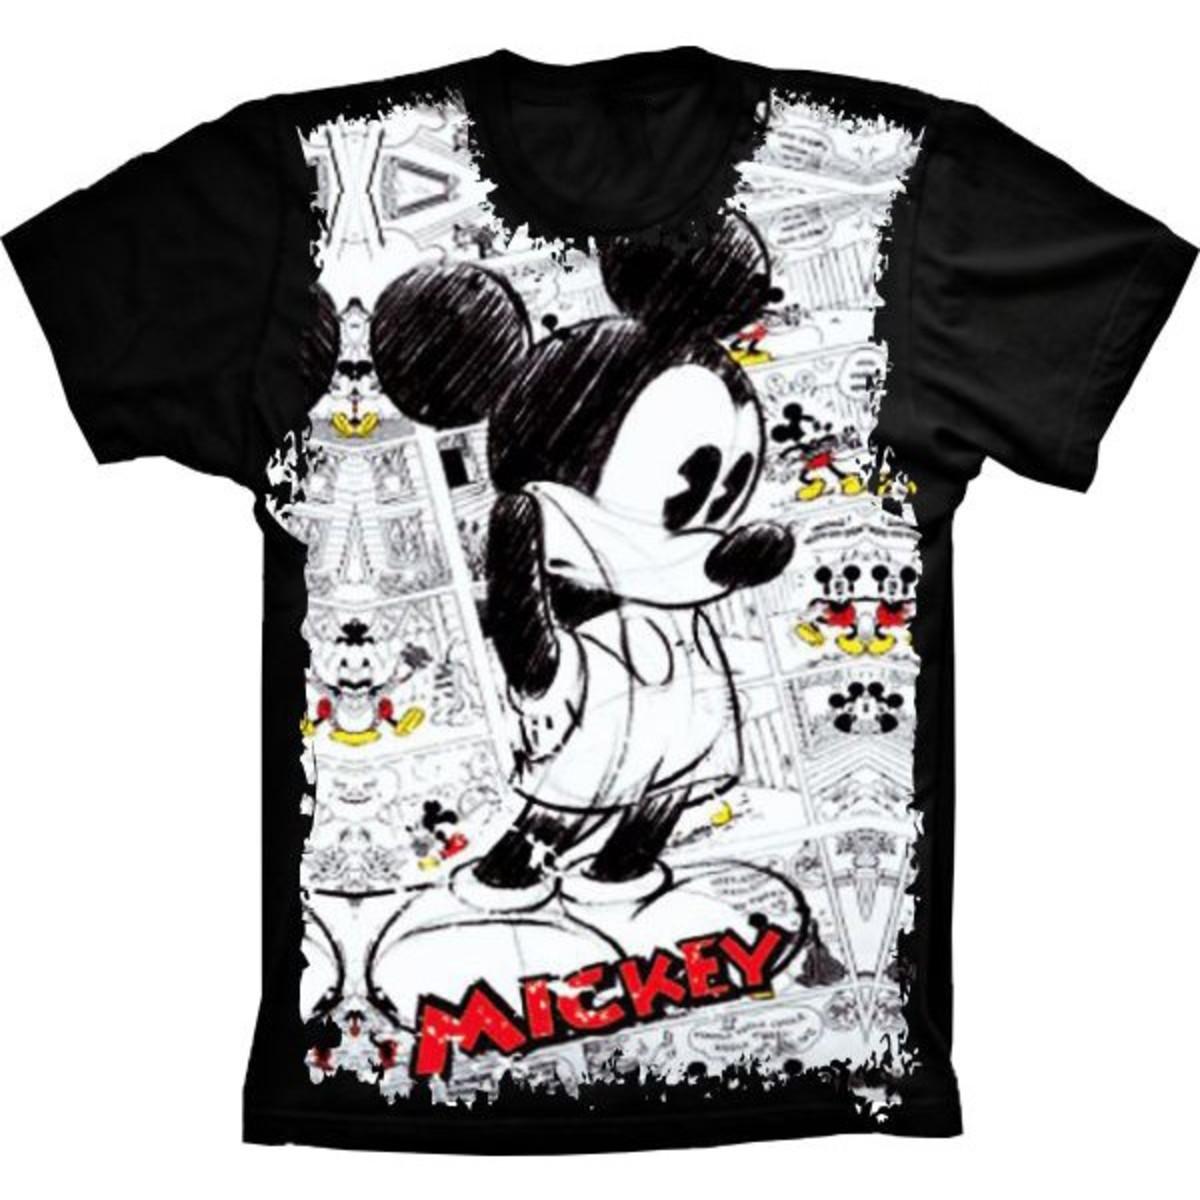 c75690acc0 Camiseta Infantil Mickey Pensativo no Elo7